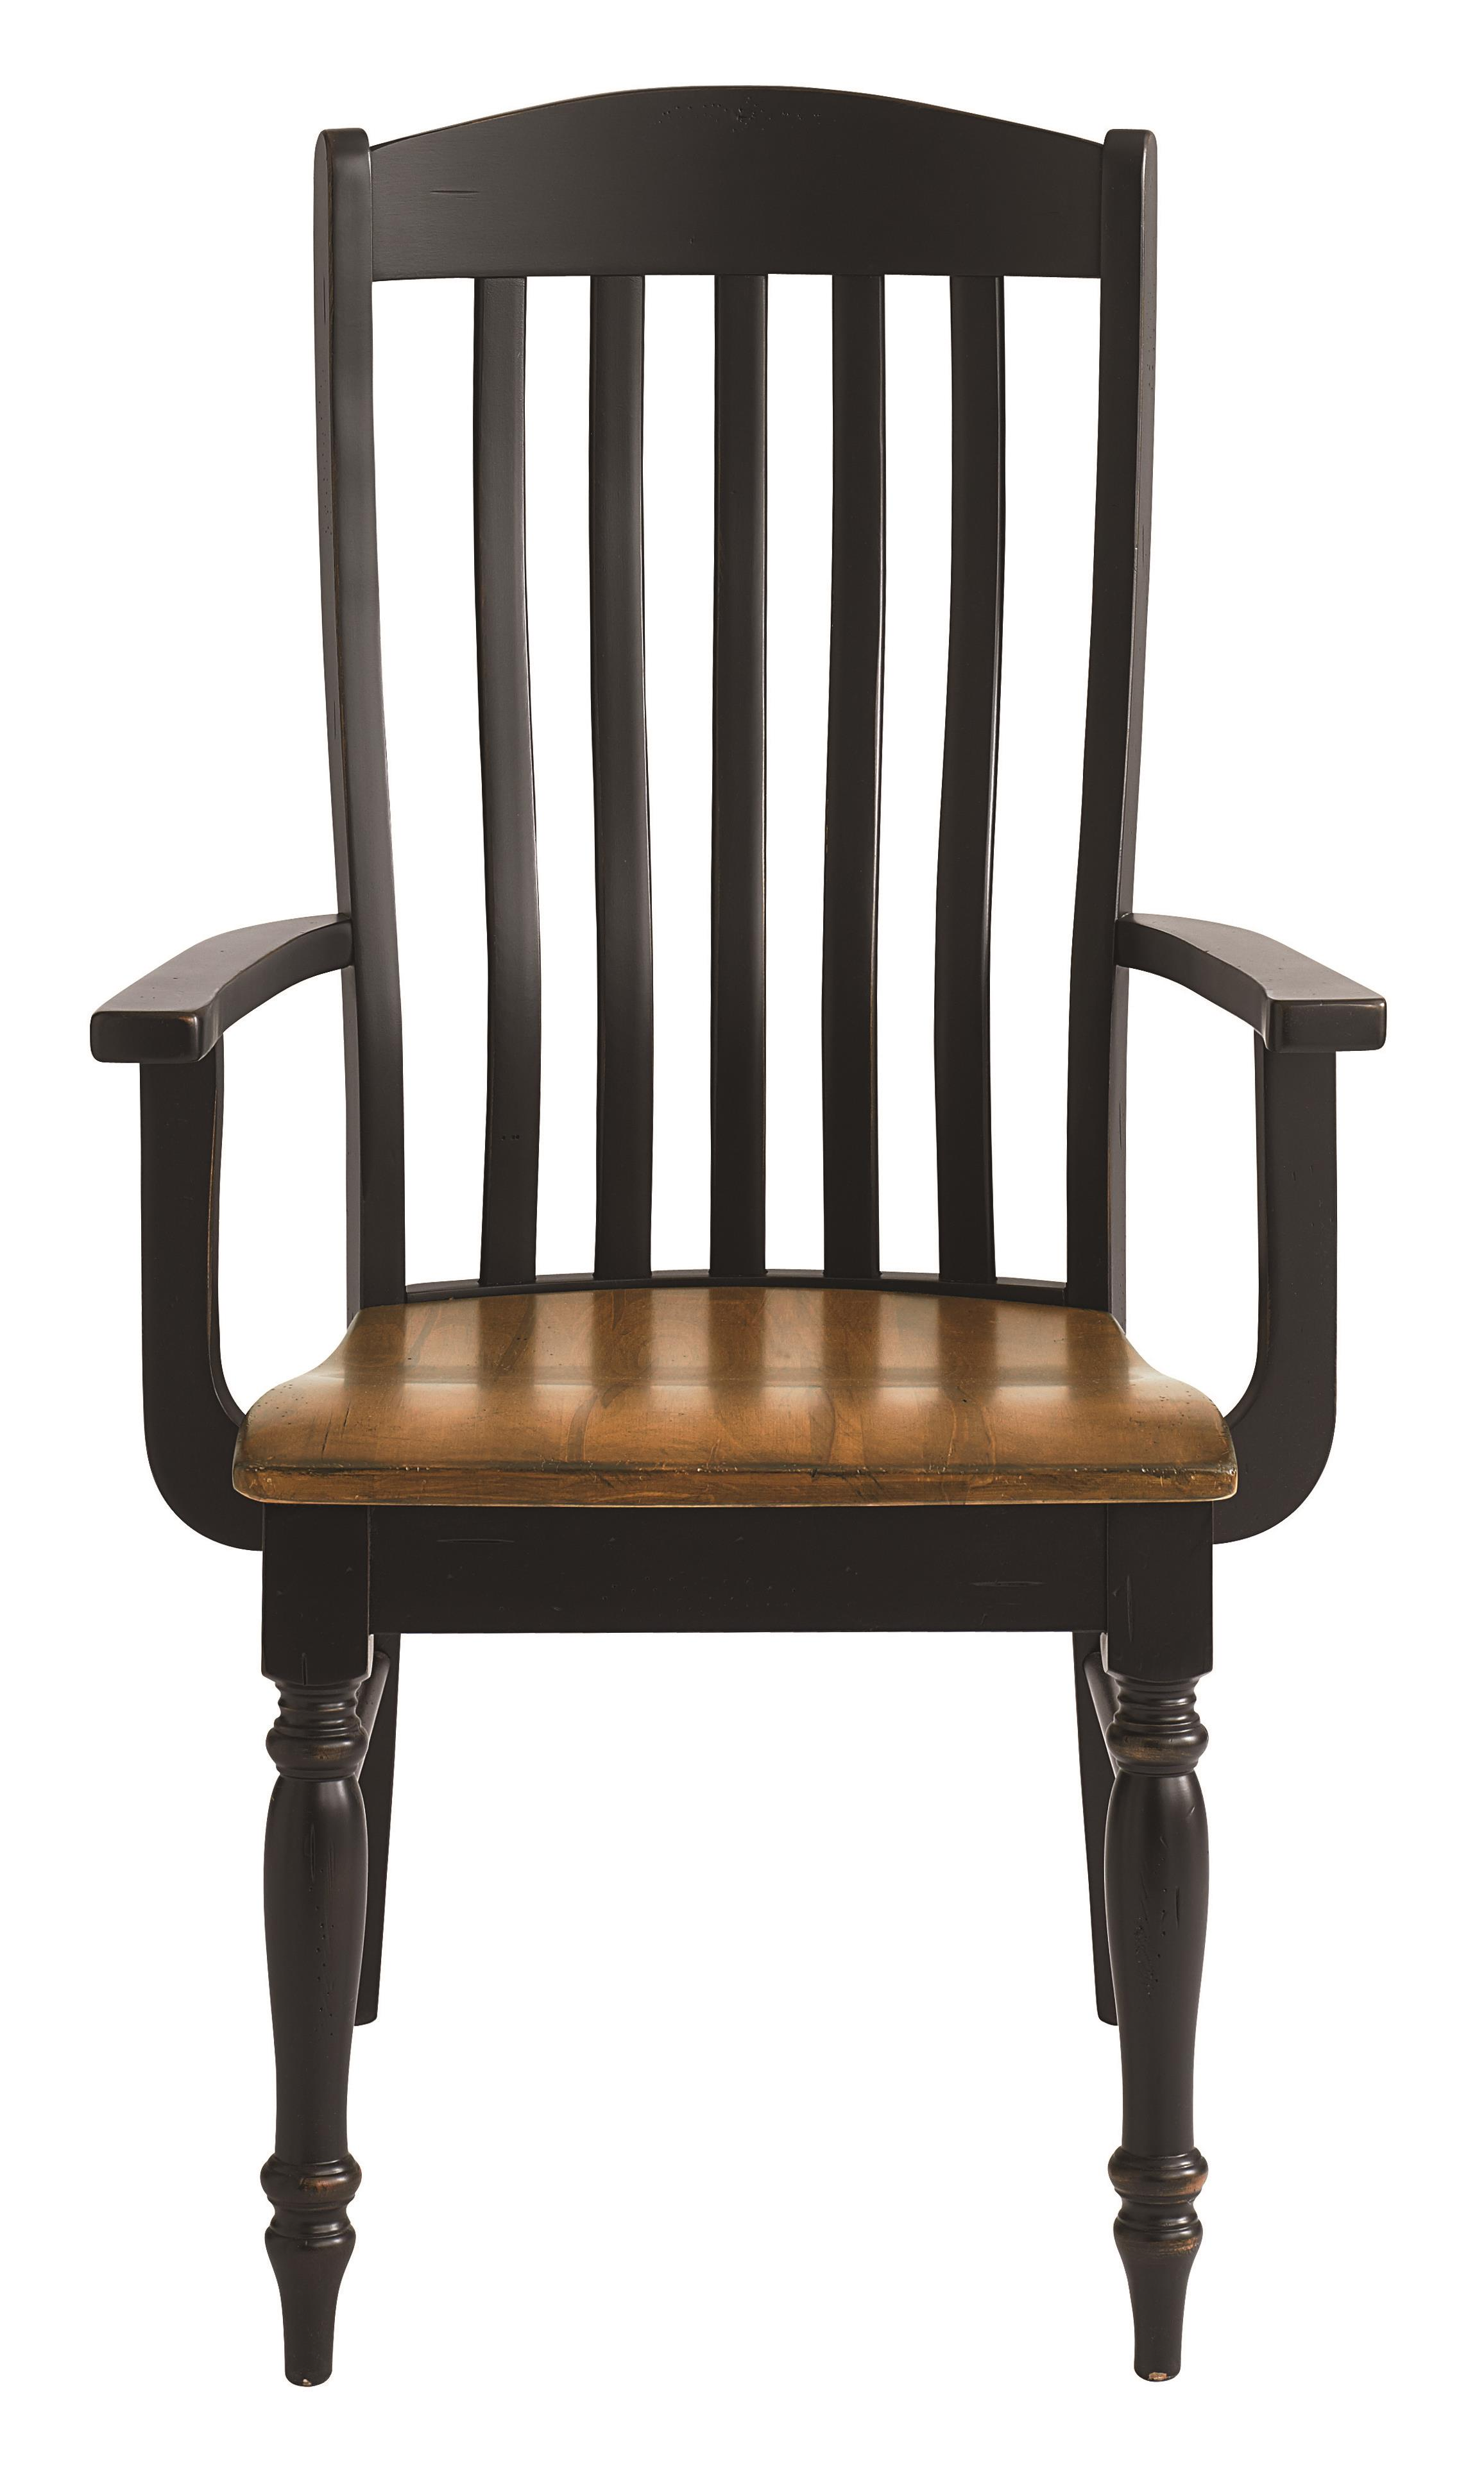 Bassett Bench Made Henry Arm Chair - Item Number: 4015-1000-HENRY-Lampblack-Agsaddle